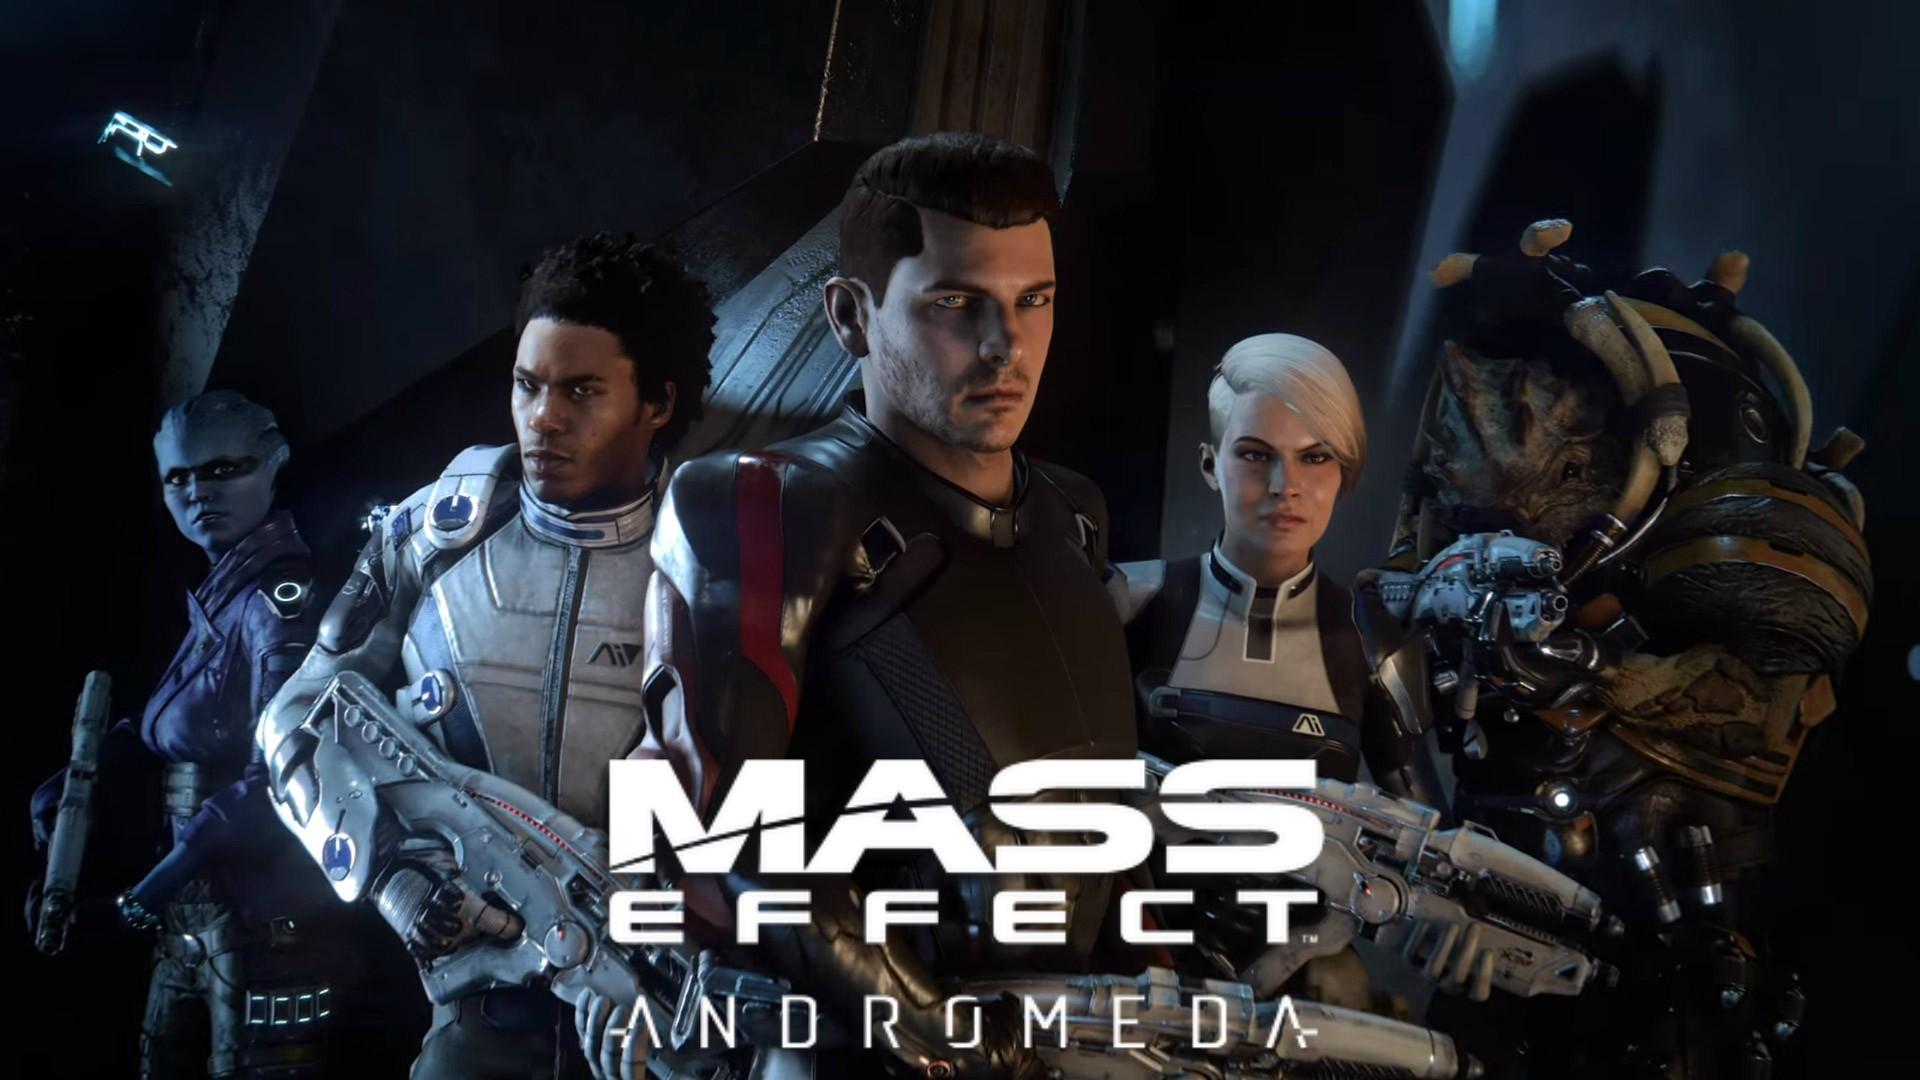 Mass Effect Andromeda.jpg - Mass Effect: Andromeda